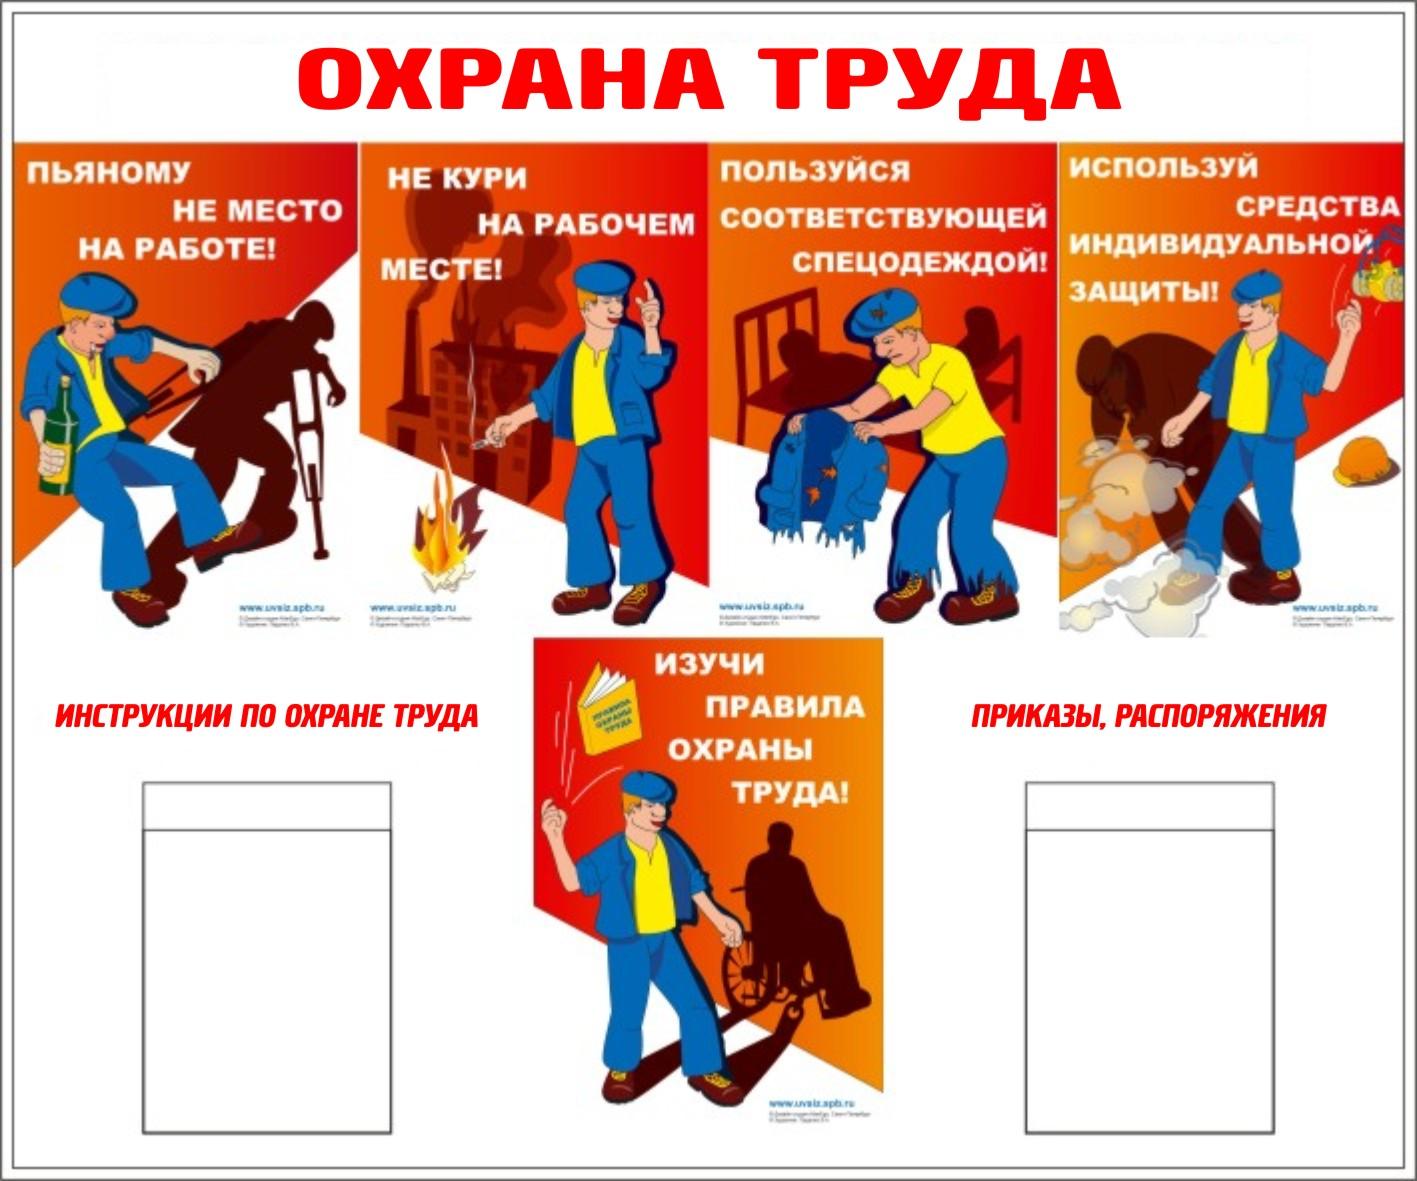 инструкции по охране труда в школах беларуси